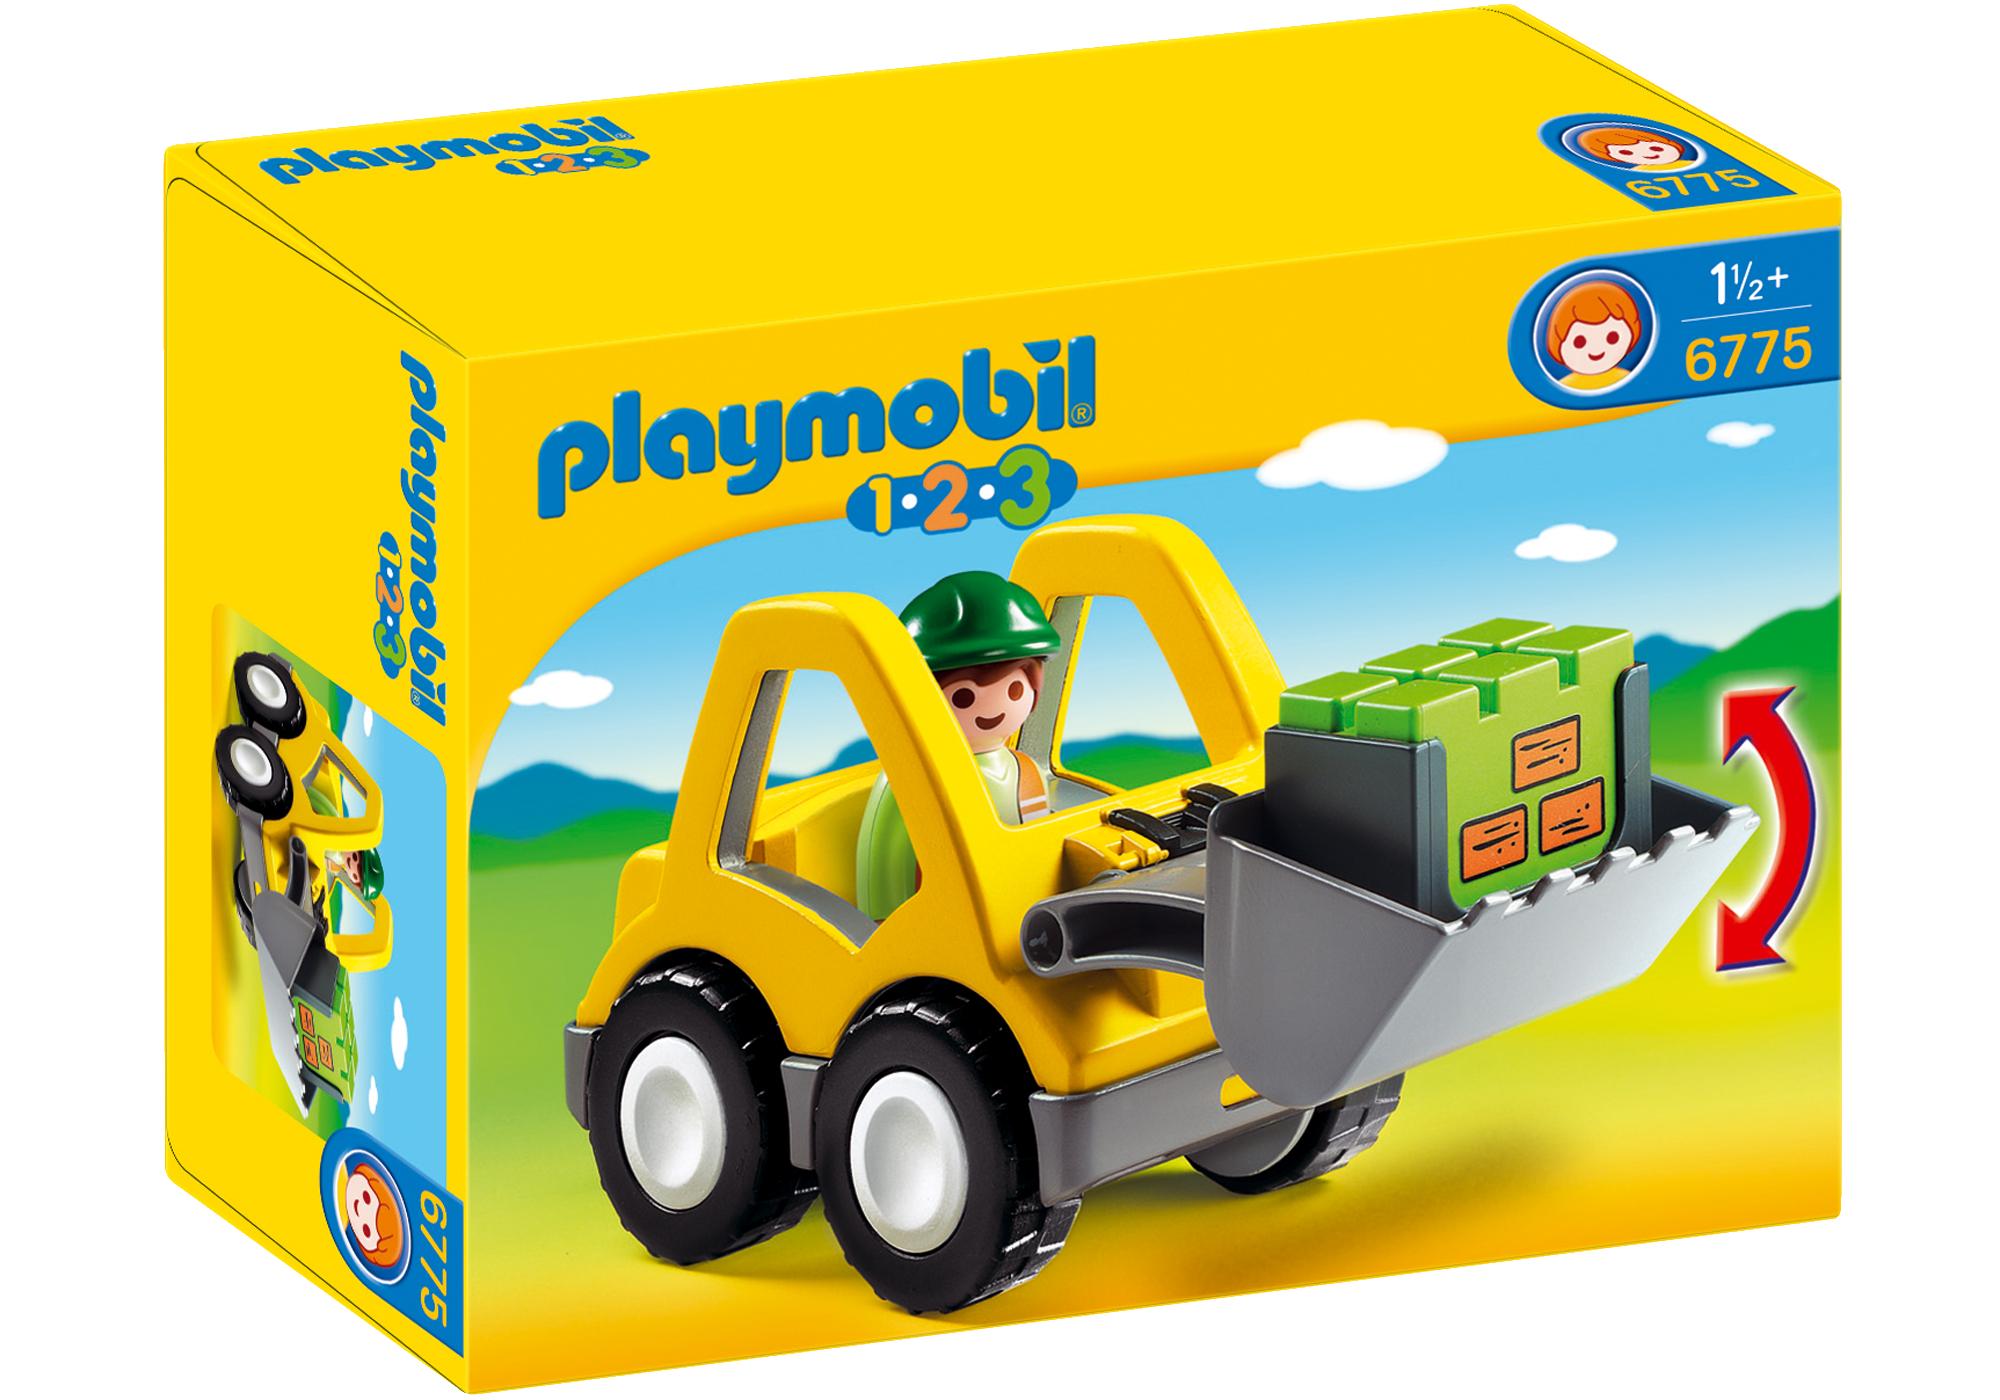 http://media.playmobil.com/i/playmobil/6775_product_box_front/1.2.3 Excavator